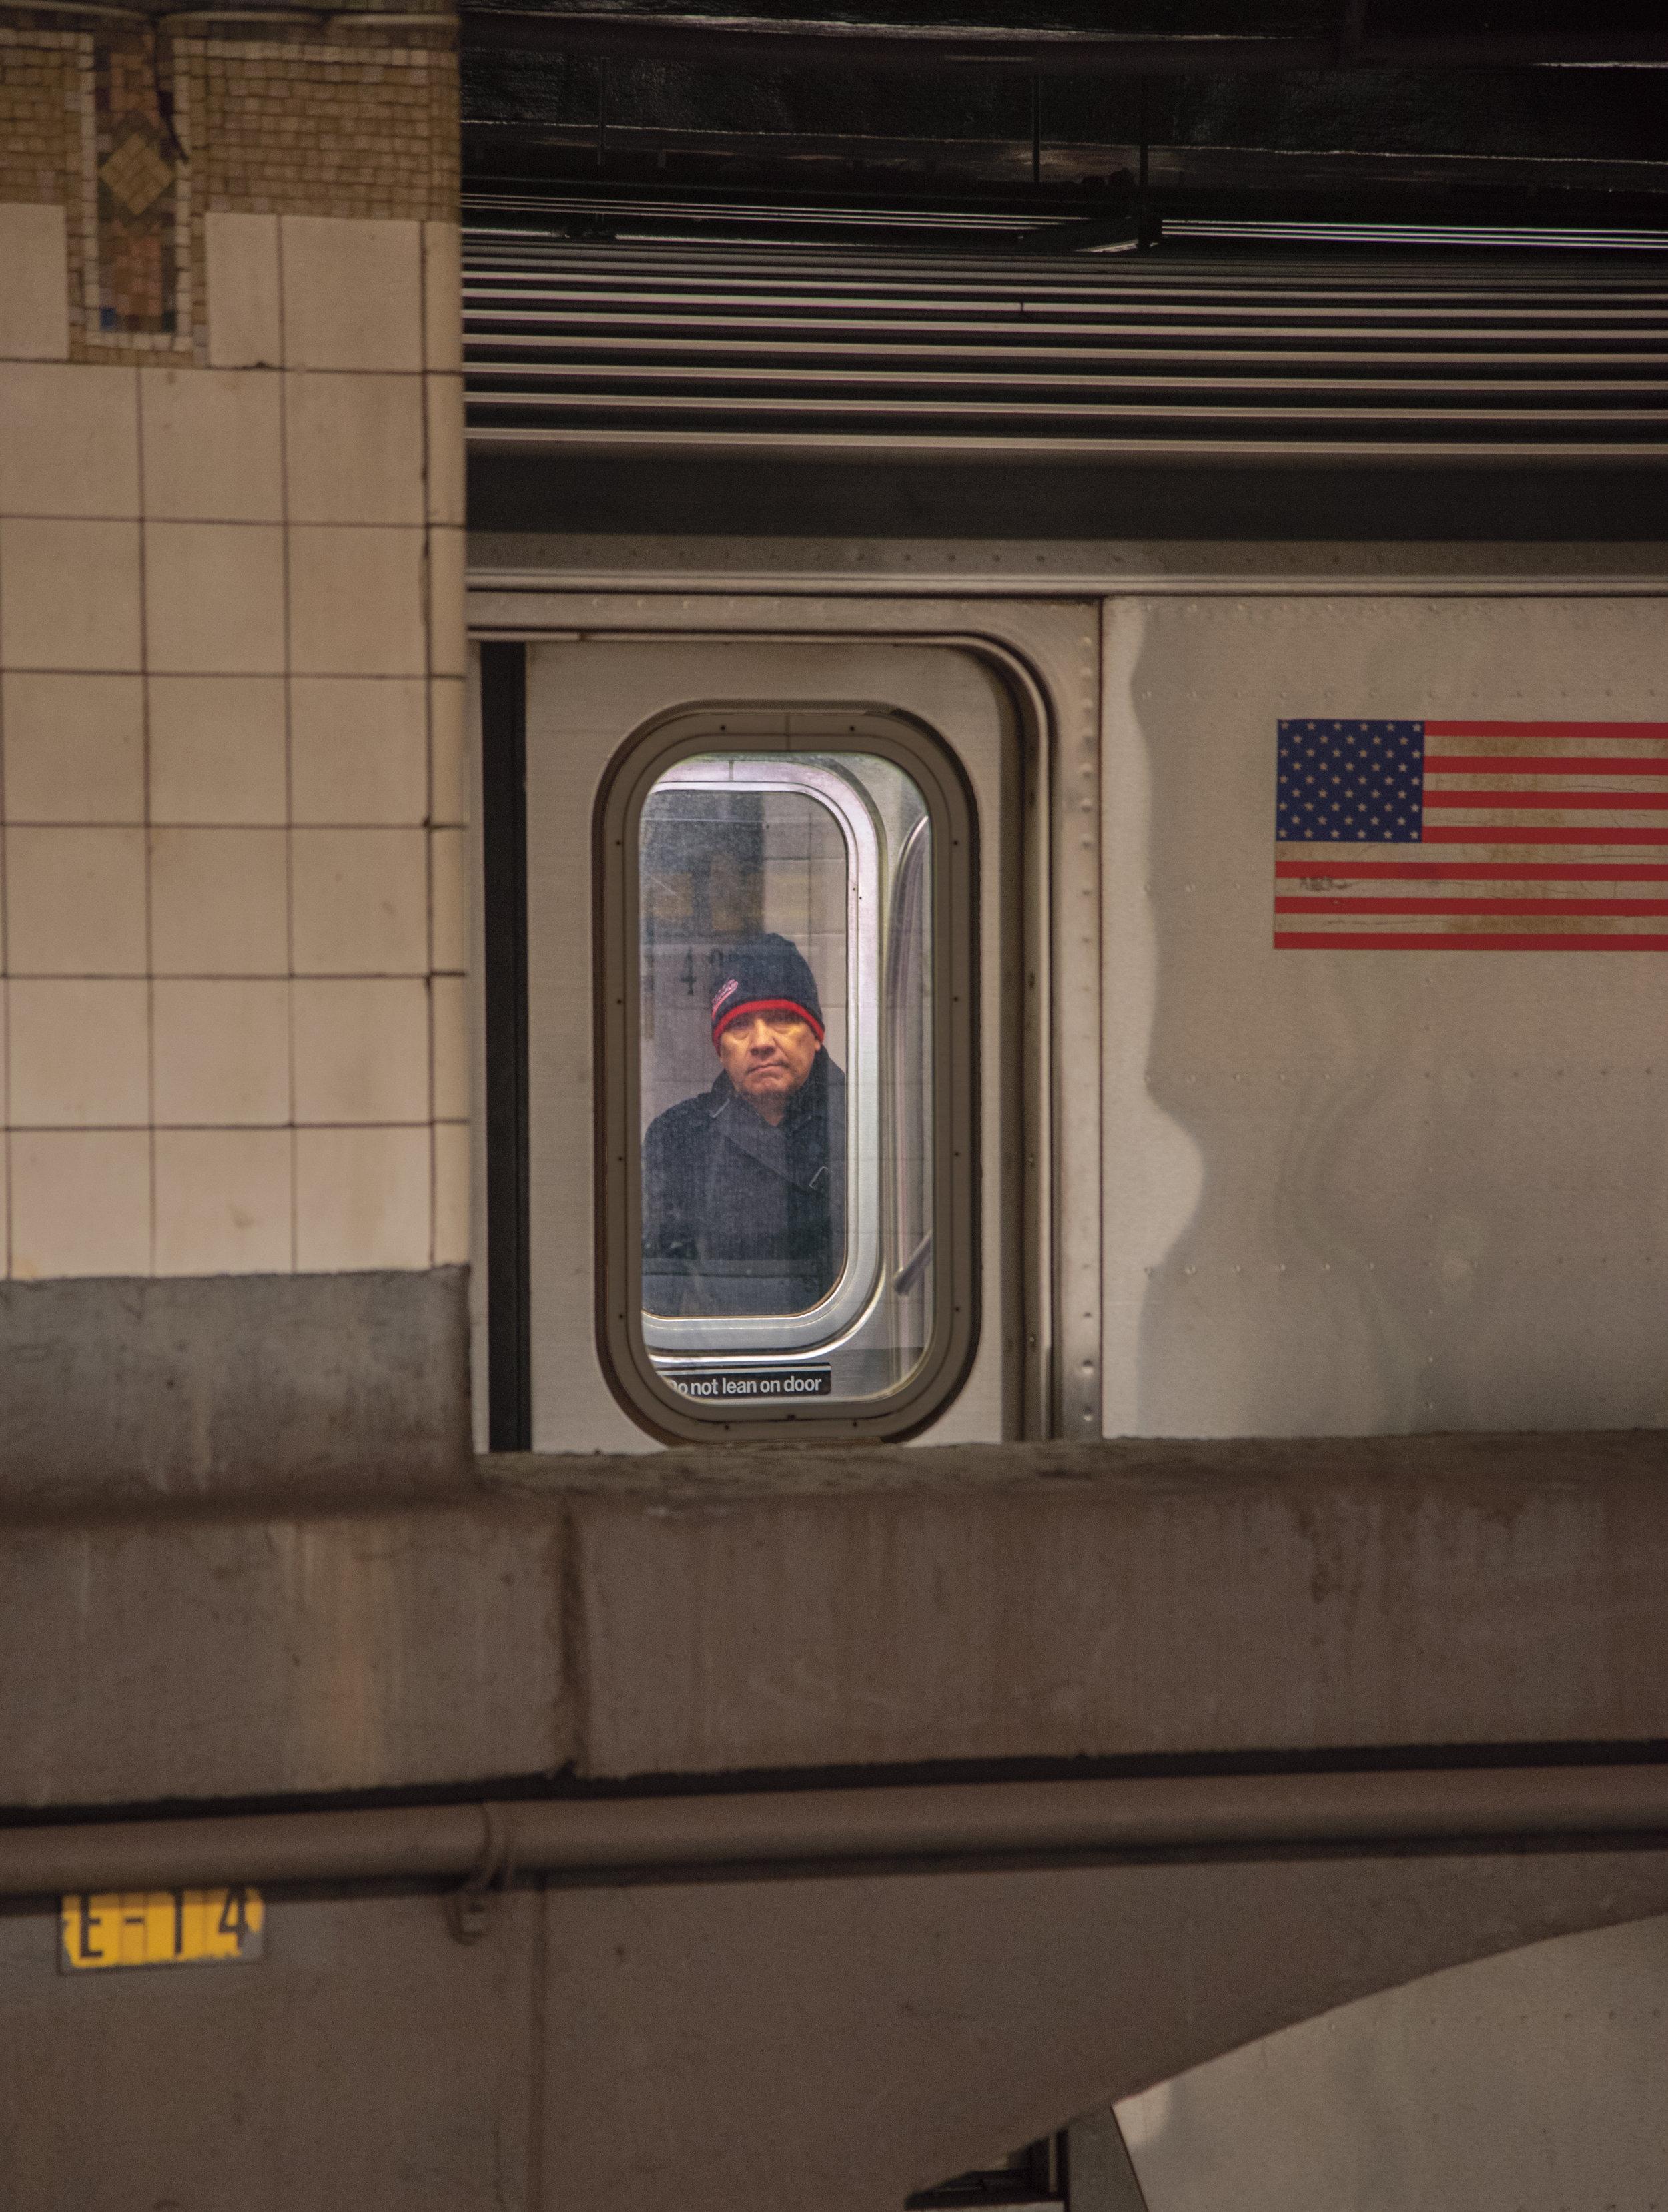 face-through-train-doors.jpg